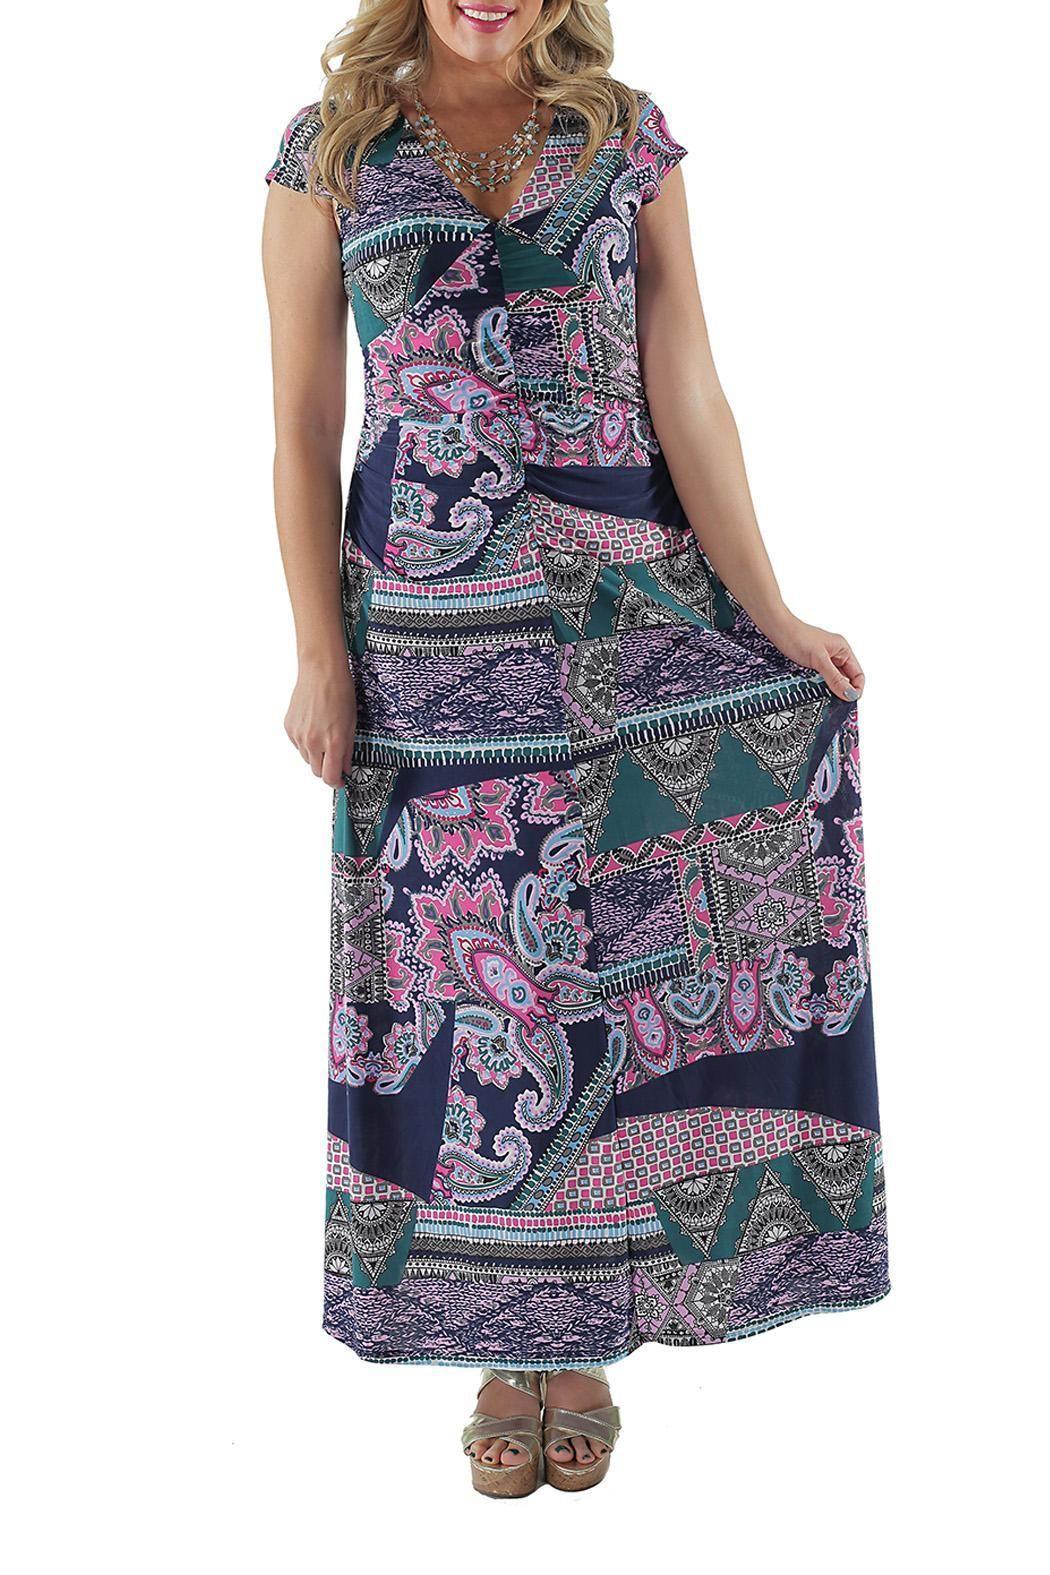 comfort apparel paisley maxi dress maxi dresses red purple